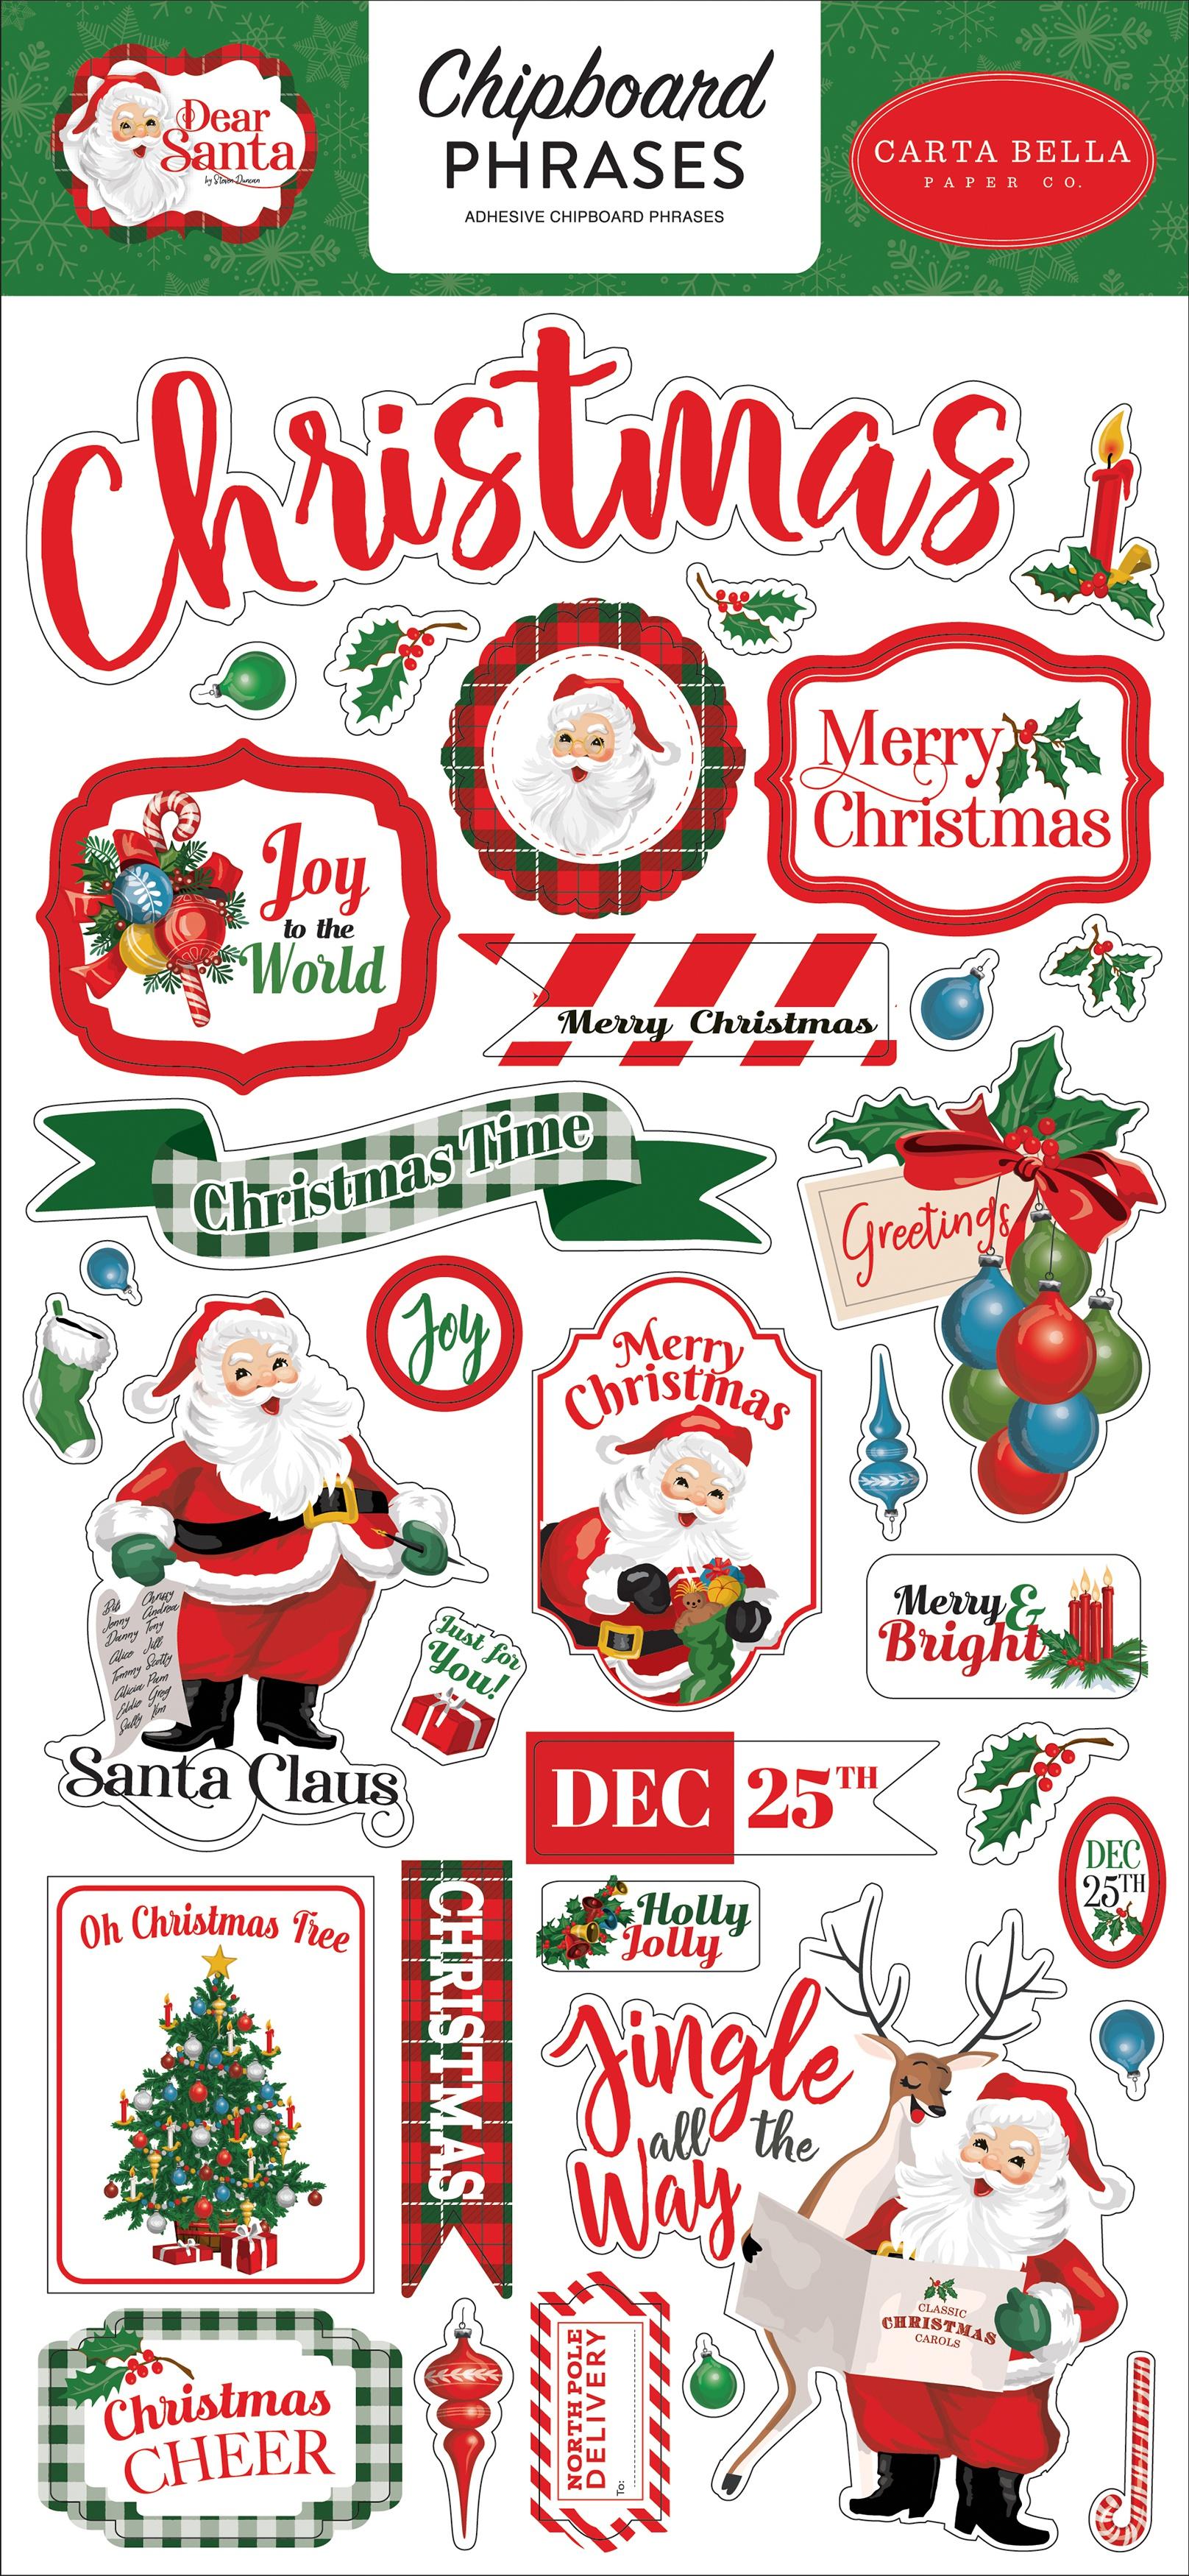 Dear Santa Chipboard 6X13-Phrases